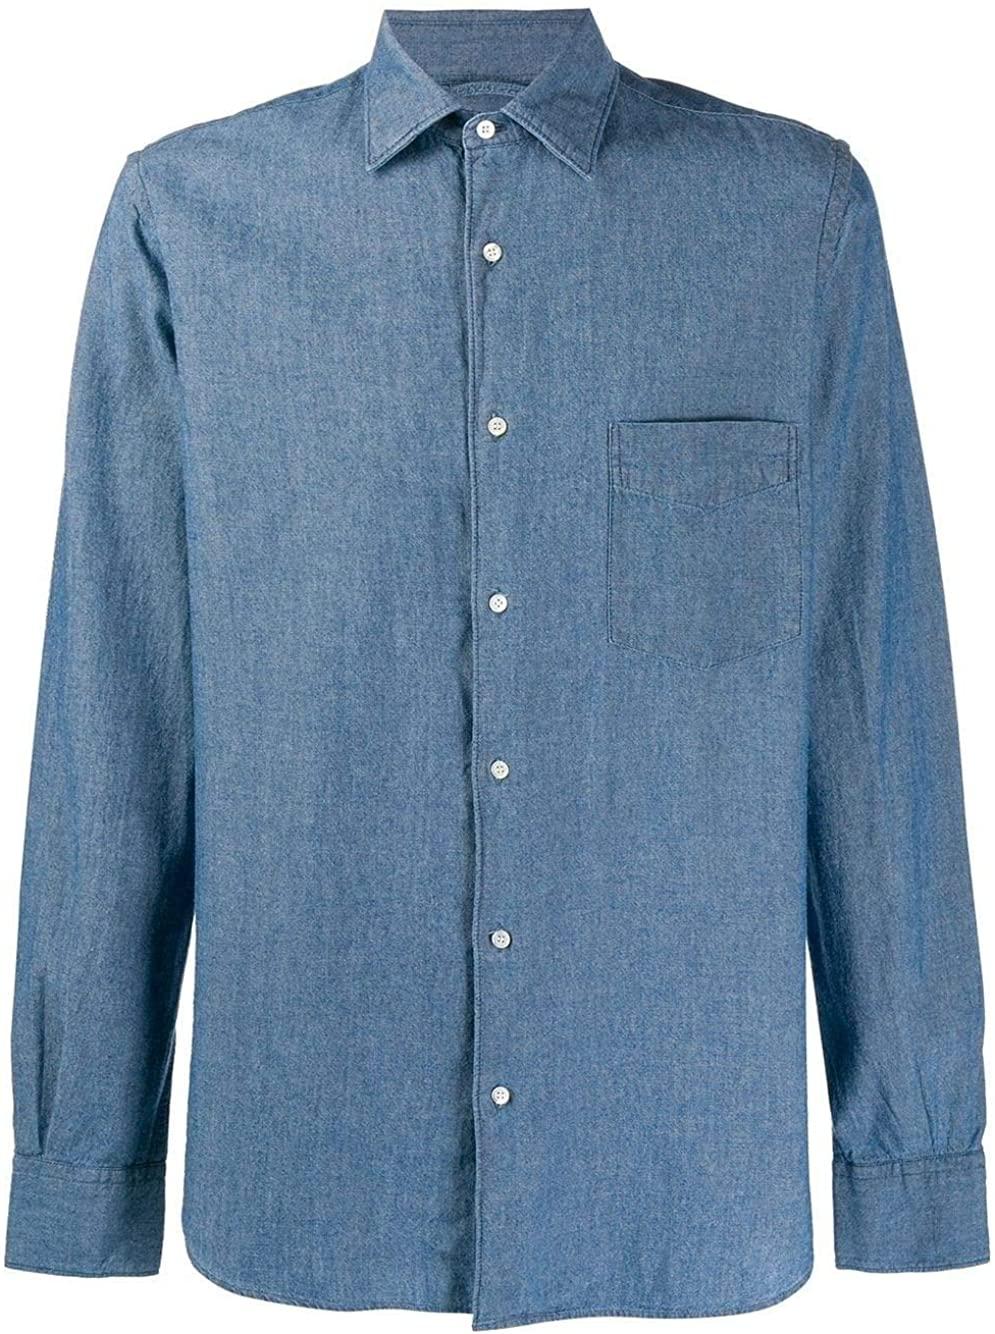 Aspesi Luxury Fashion Man CE36E54201031 Blue Cotton Shirt   Spring Summer 20